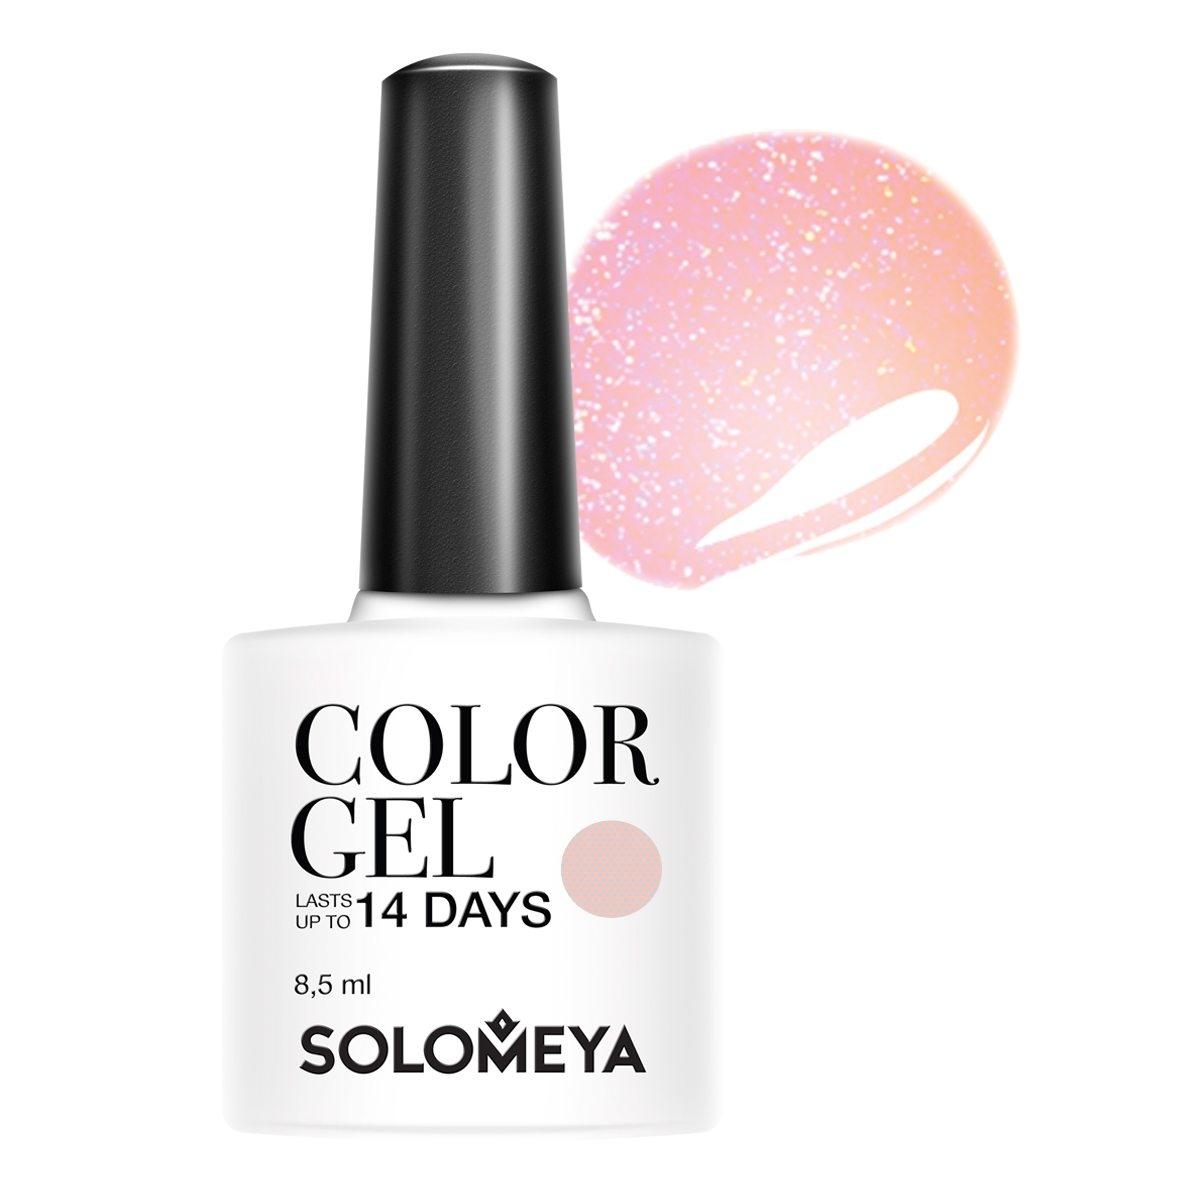 Solomeya Гель-Лак Color Gel My darling SCGK005 Мой Дорогой 67, 8,5 мл